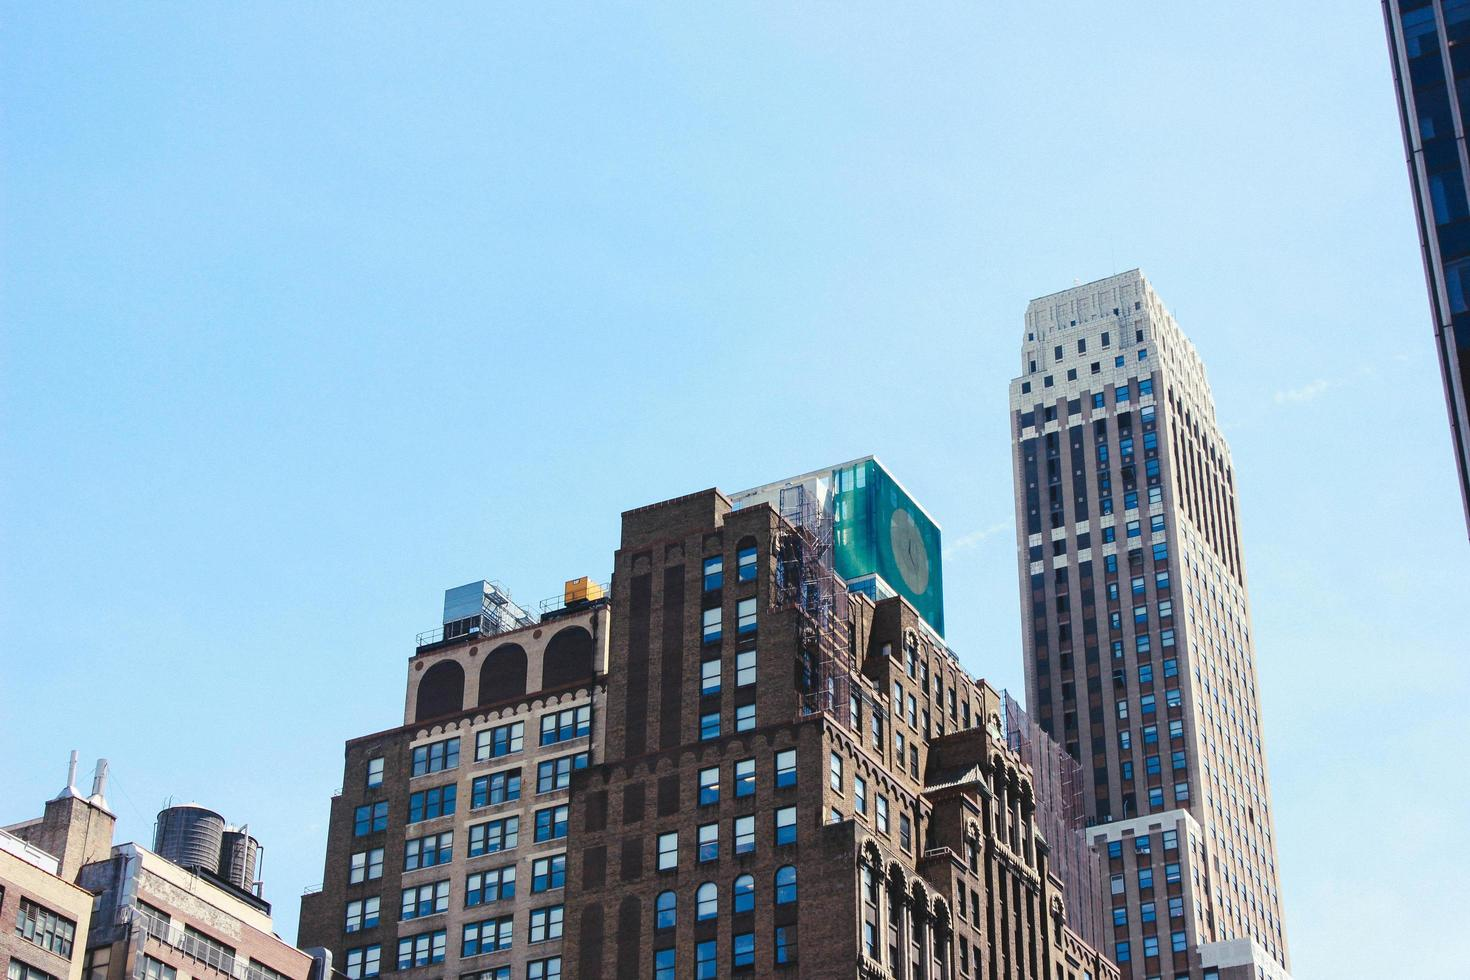 new york city, 2020 - hoogbouw in nyc foto